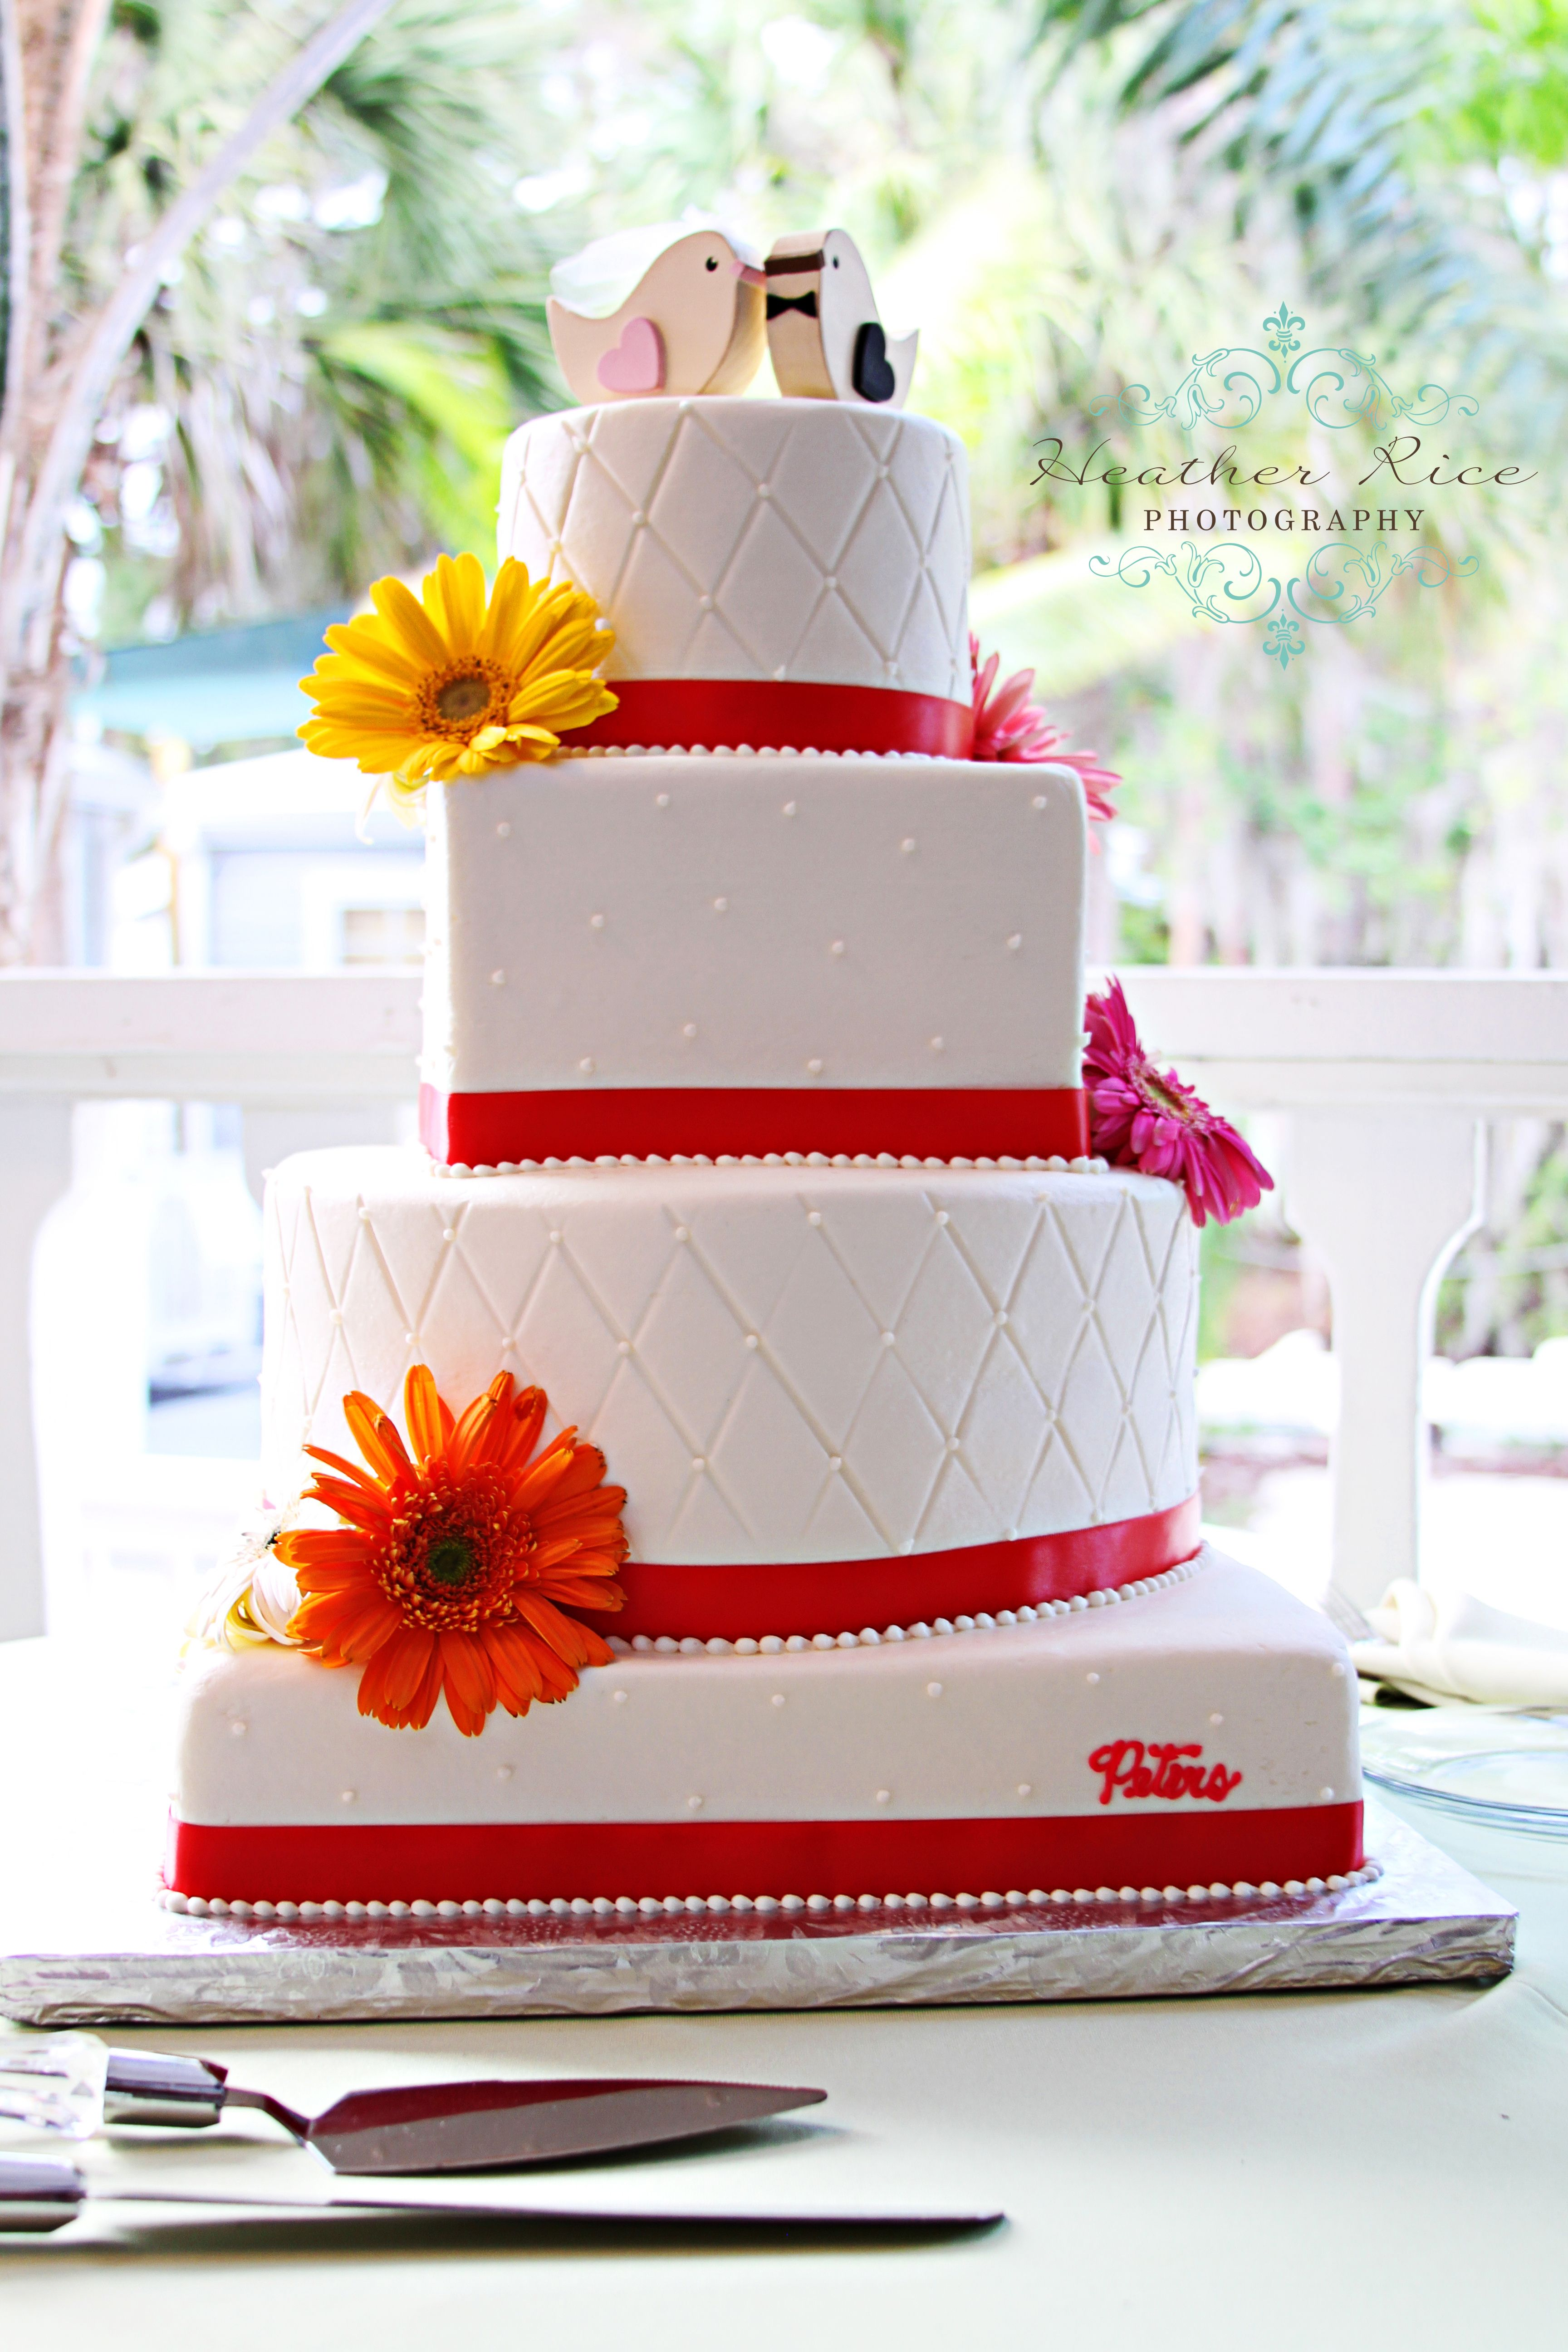 Spring wedding cake Just incase